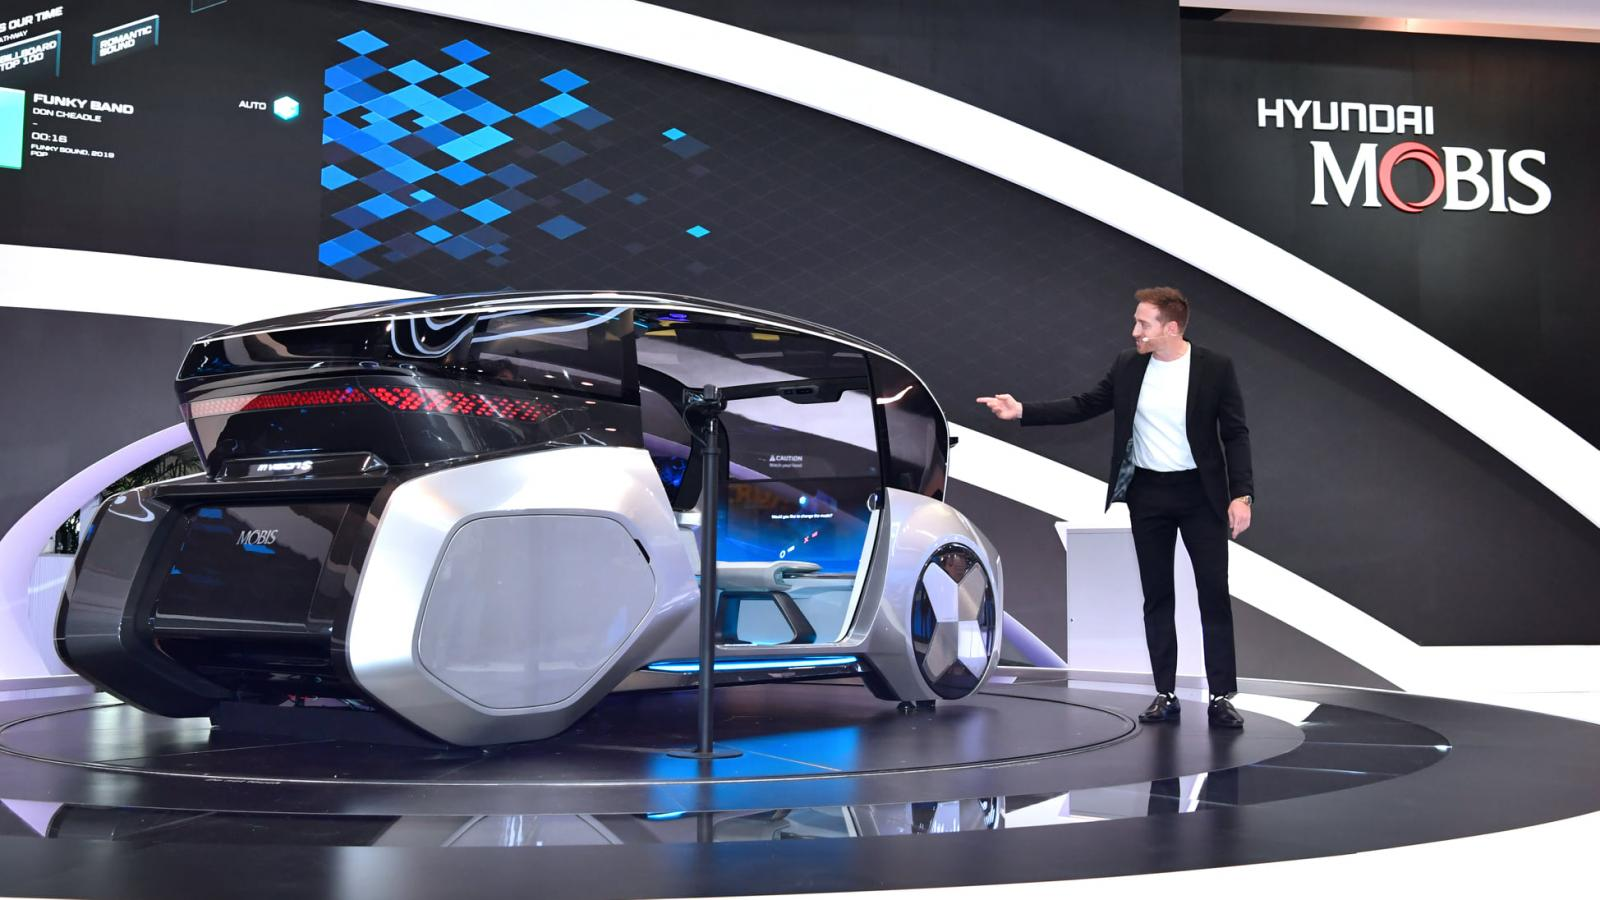 El Hyundai Mobis M.Vision S Concept llegó al CES de Las Vegas